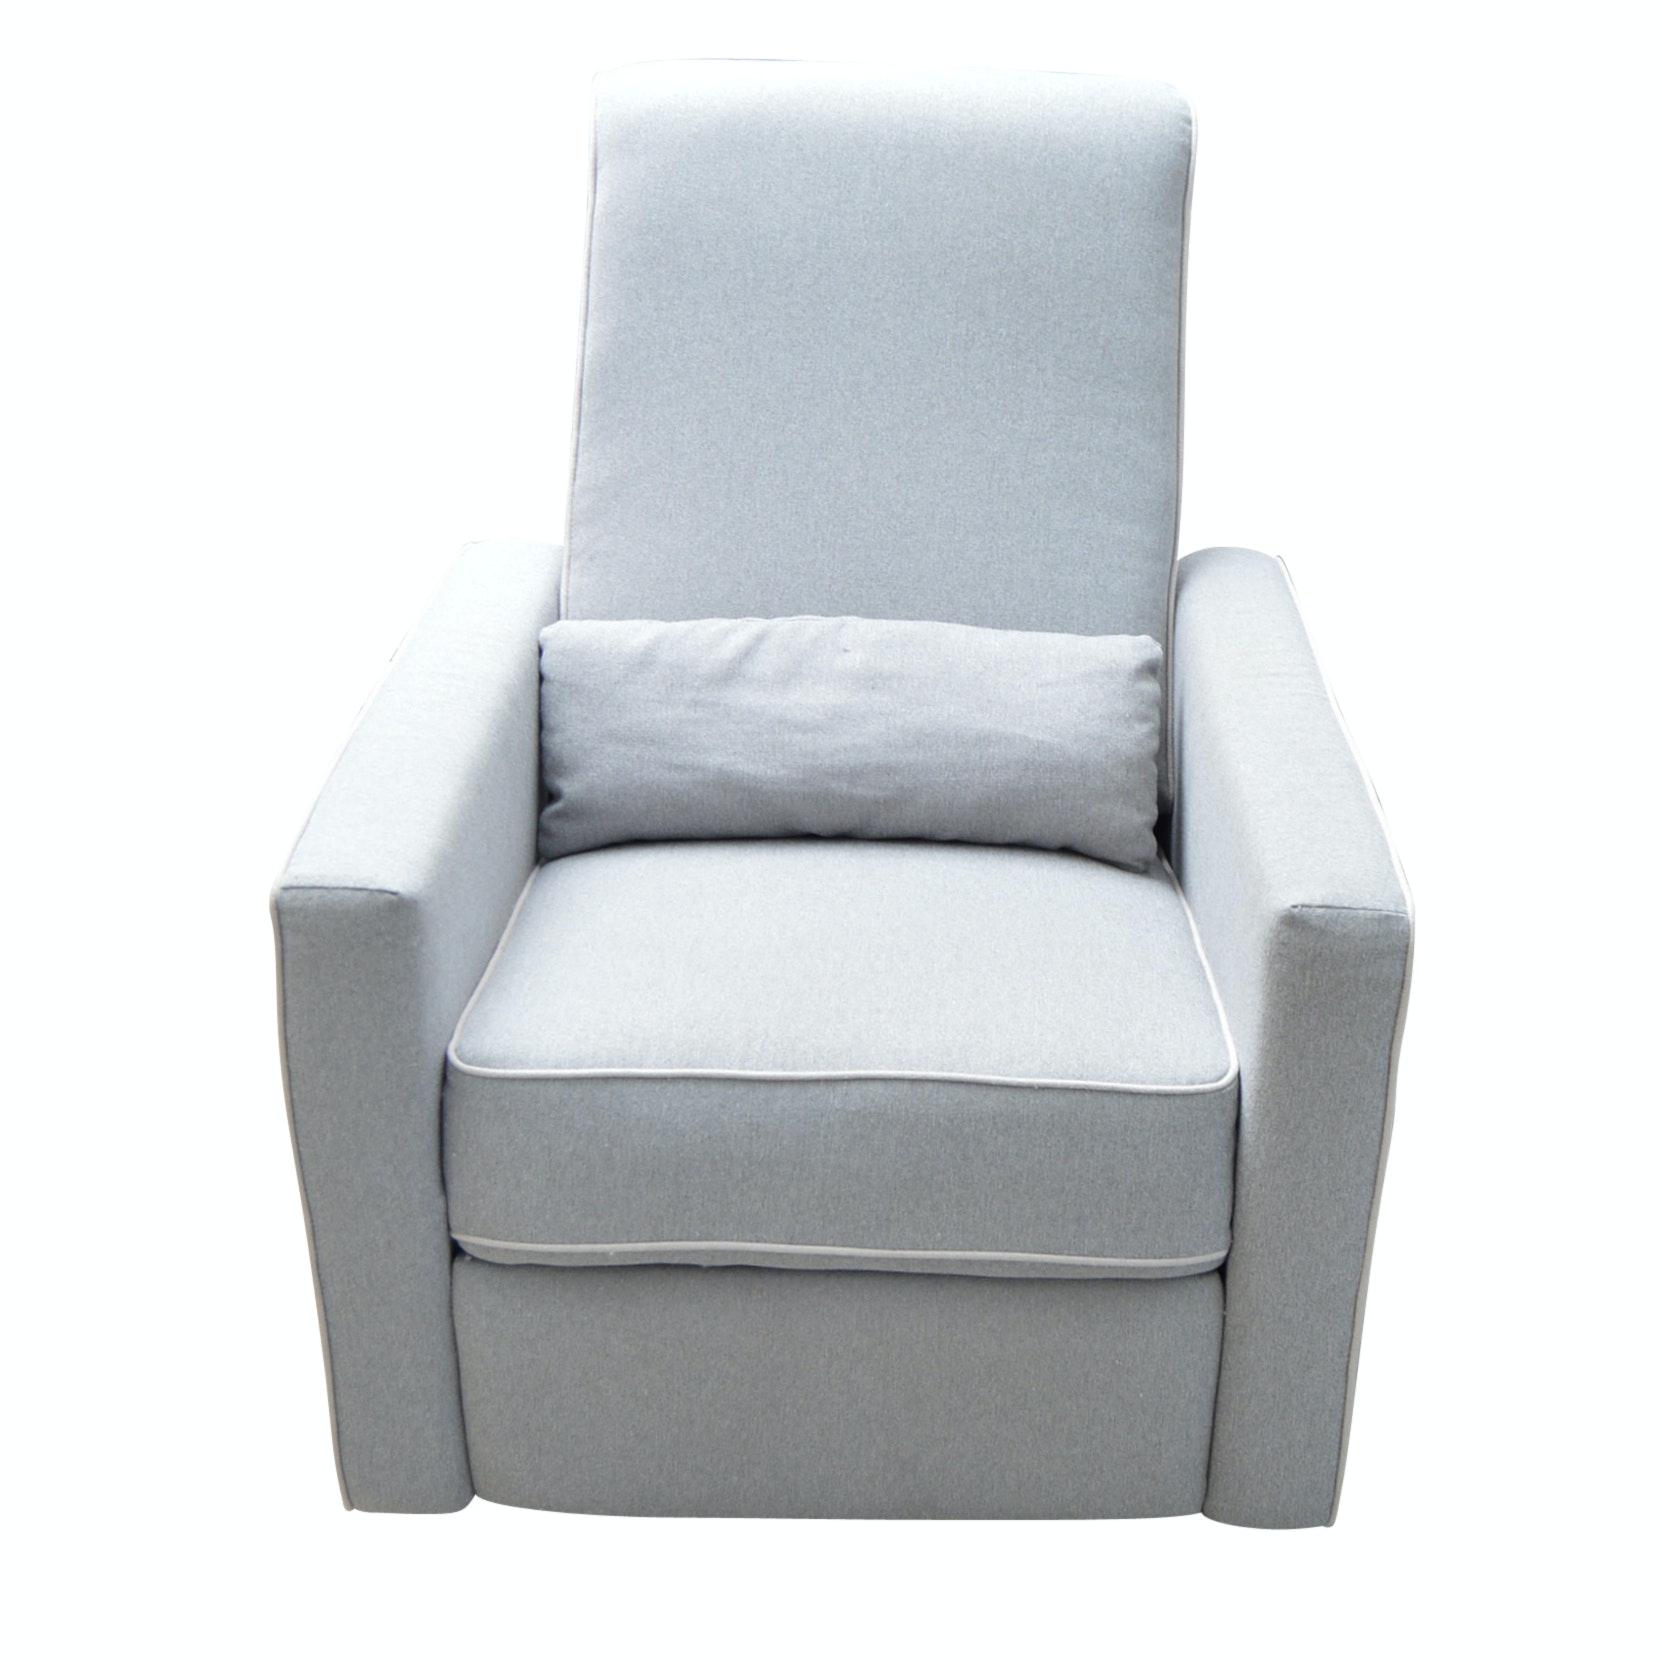 Contemporary Grey Reclining Chair From Wayfair ...